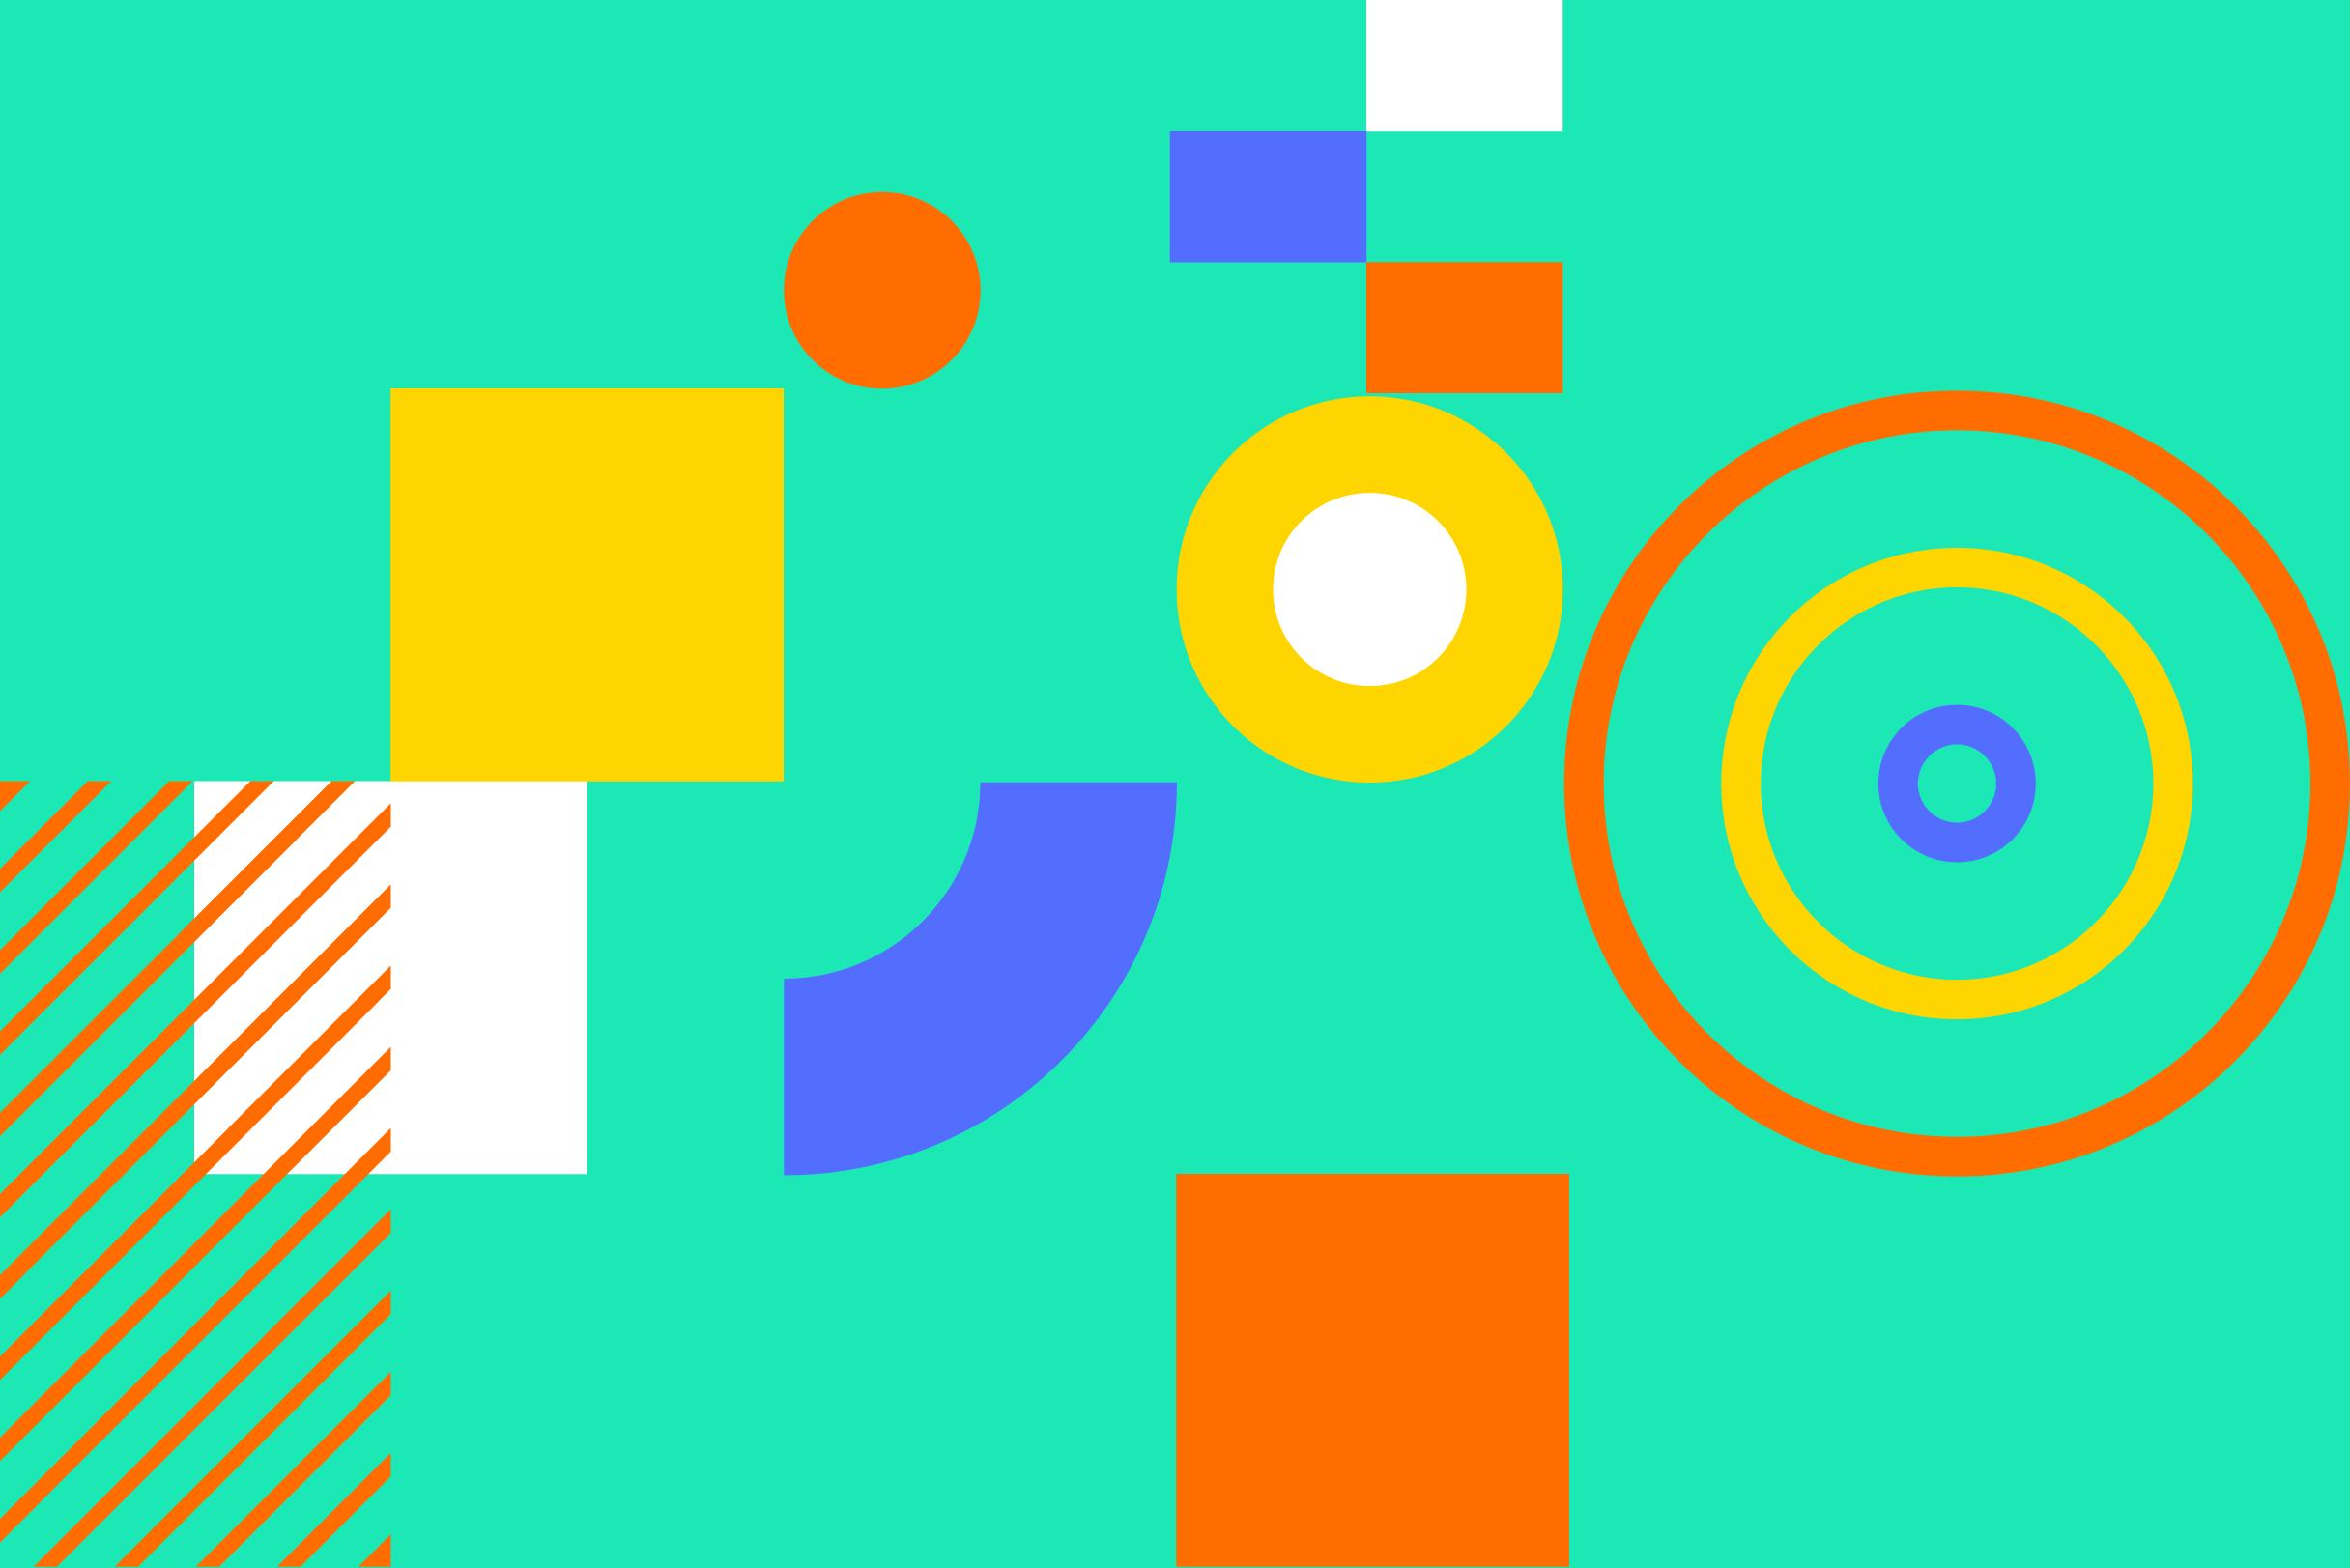 IO-DESIGNGUIDE_3x2.png